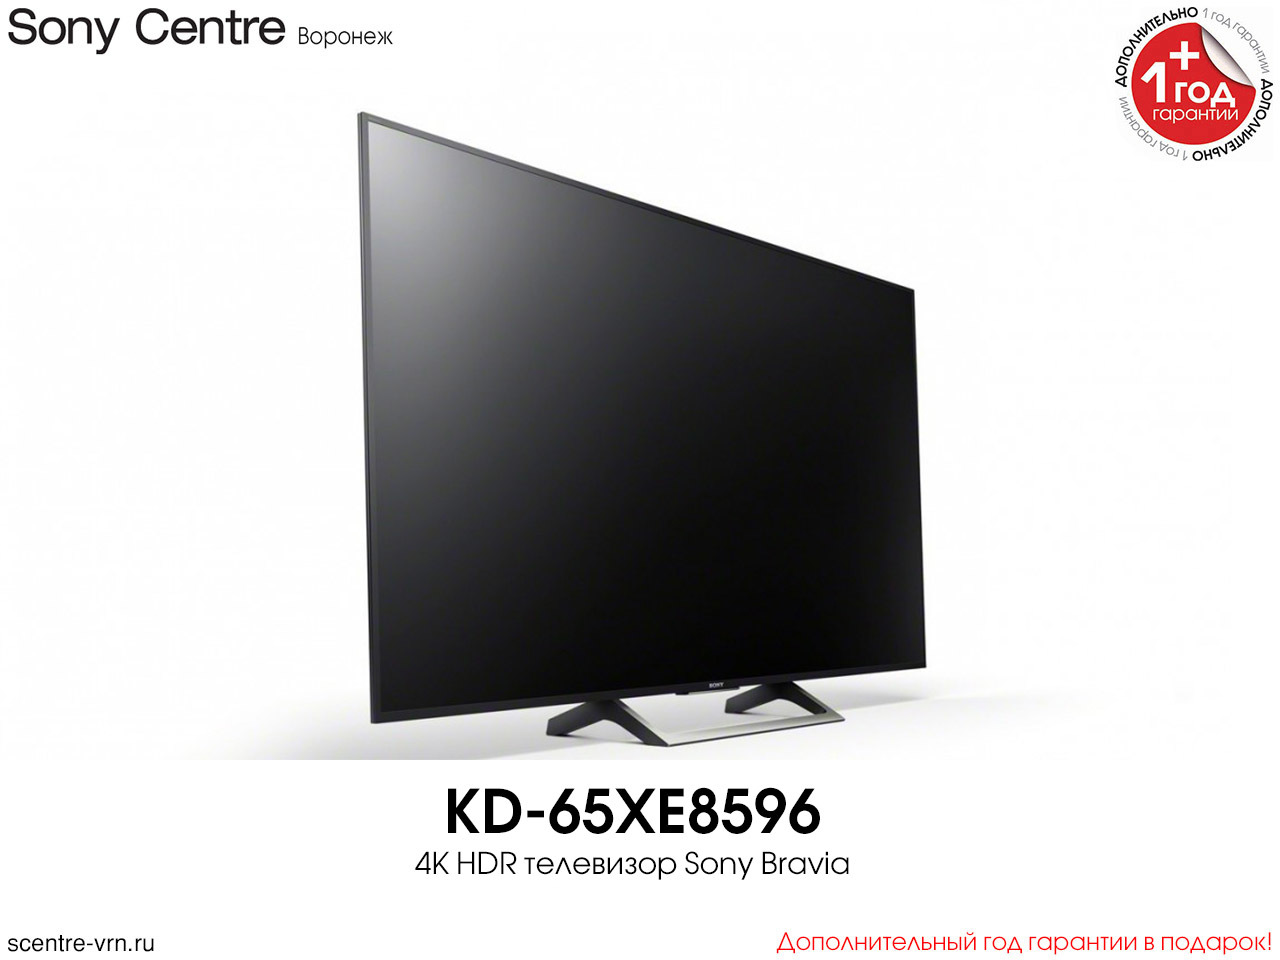 Телевизор Sony Bravia KD-65XE8596